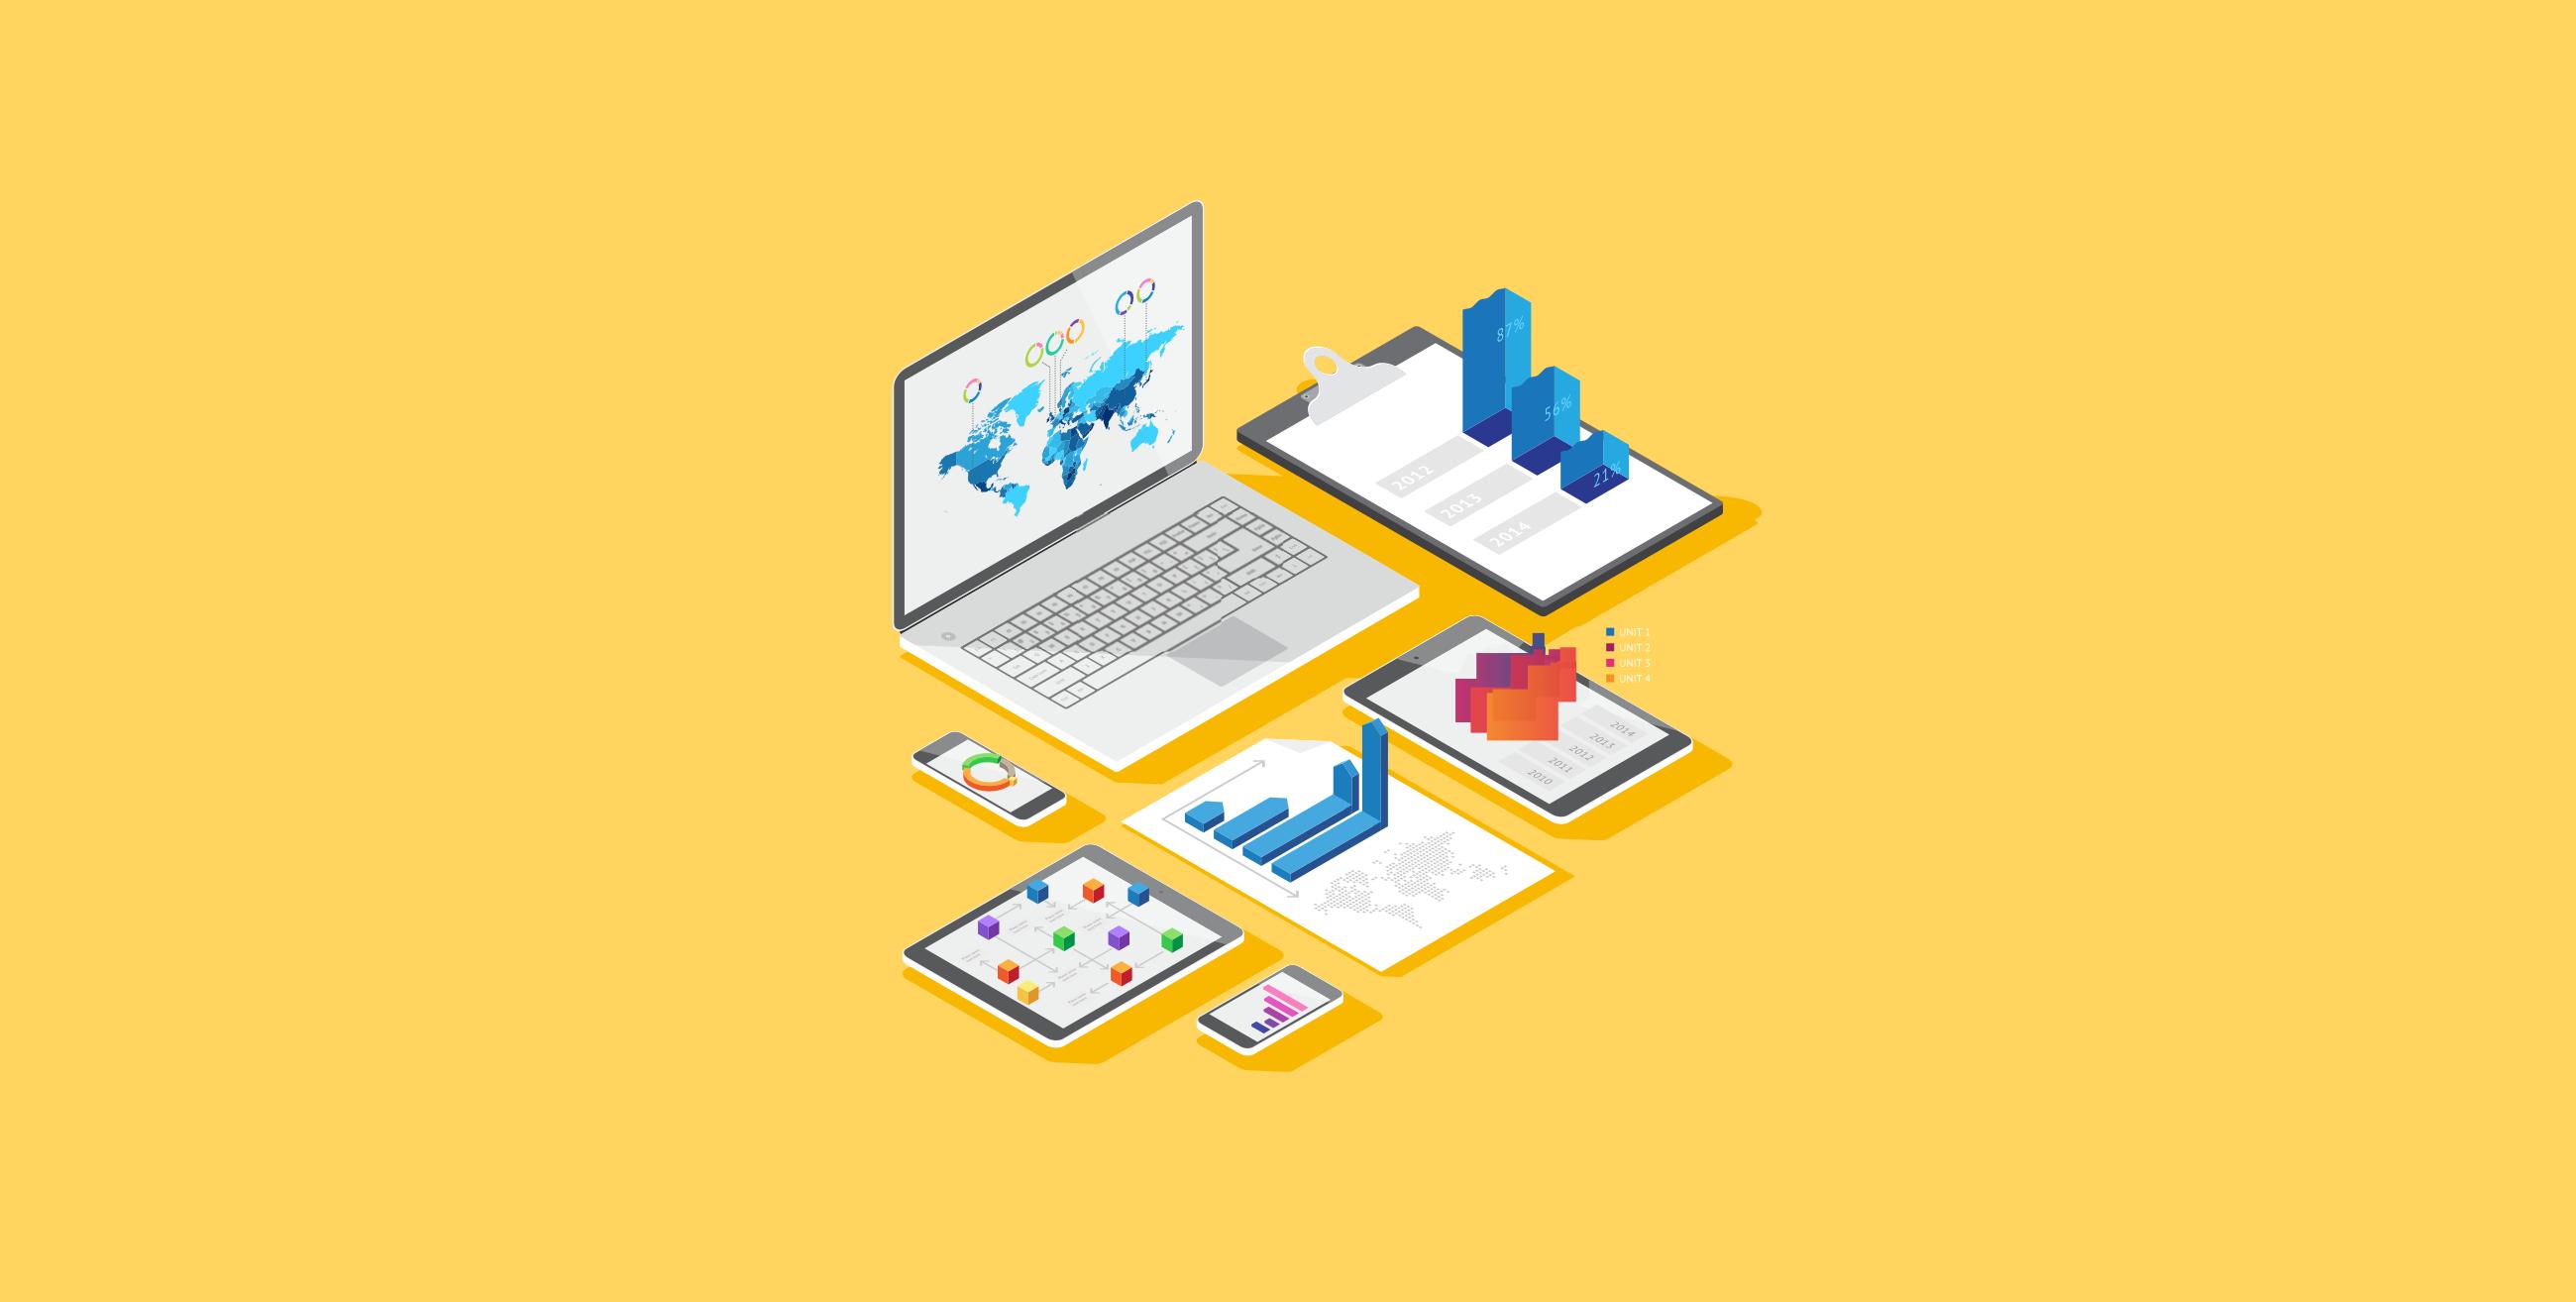 Designing Data-Driven User Interfaces